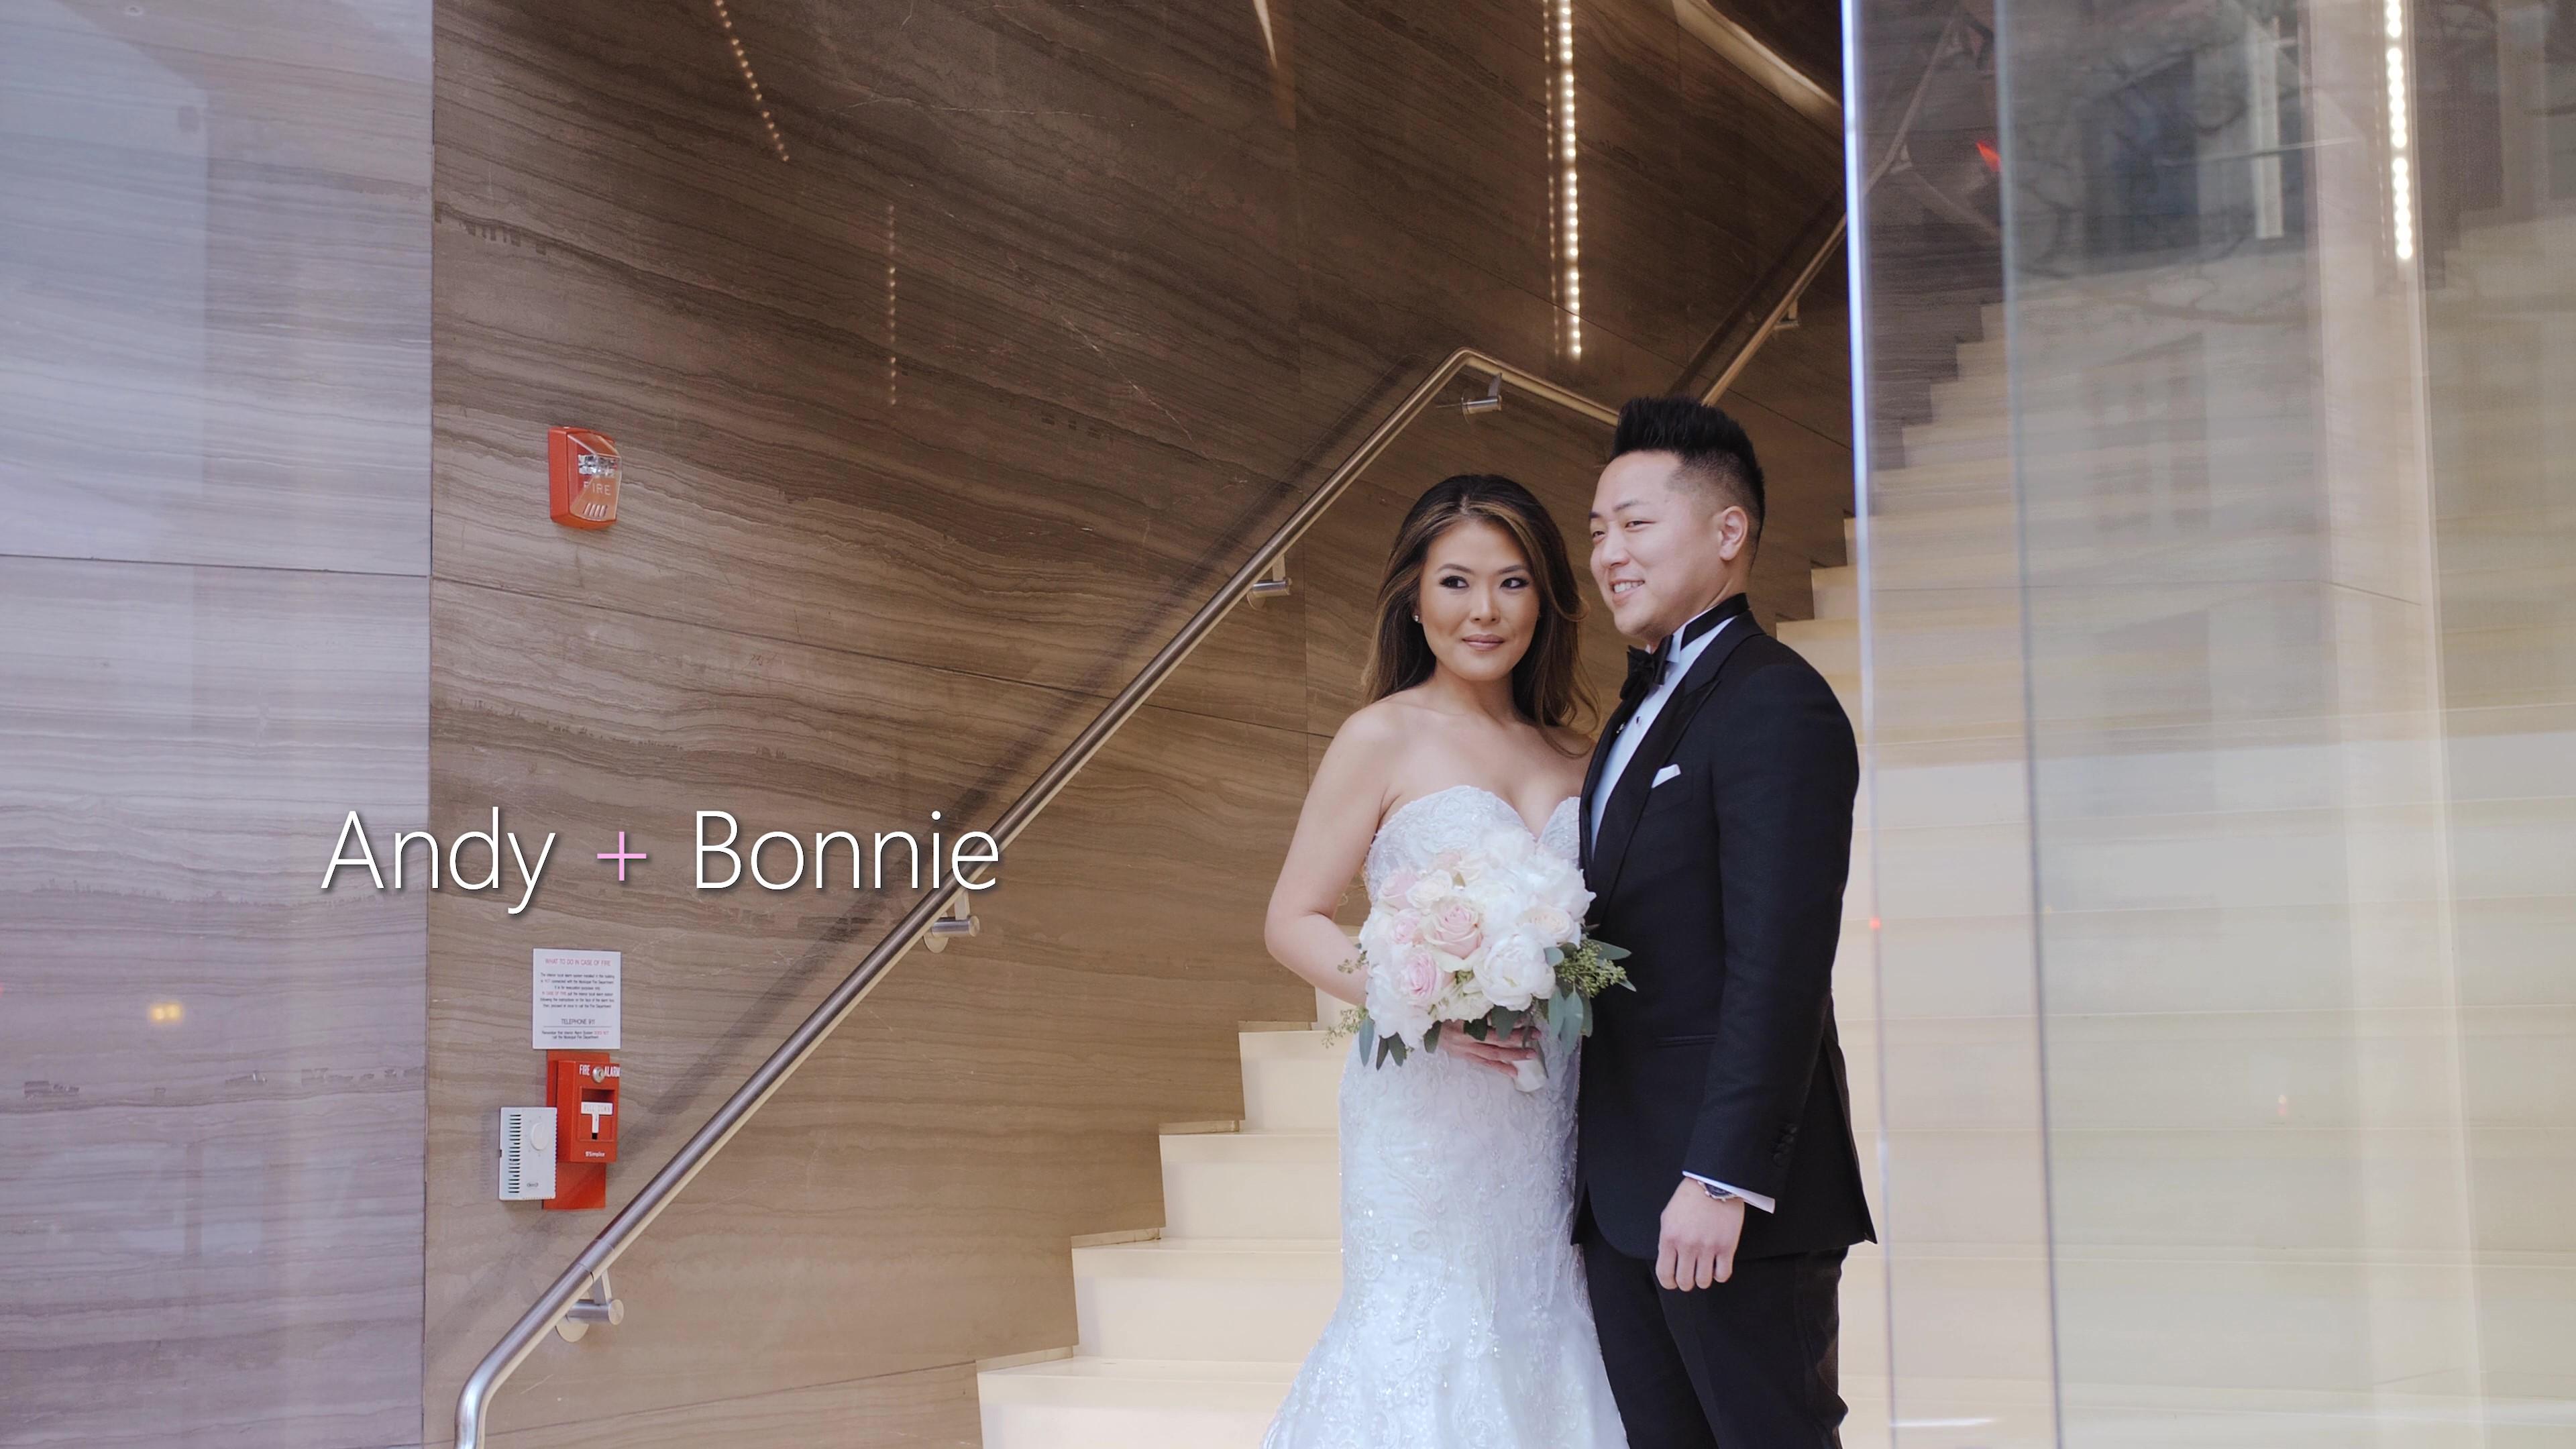 Andy + Bonnie | Bethesda, Maryland | The Ballroom